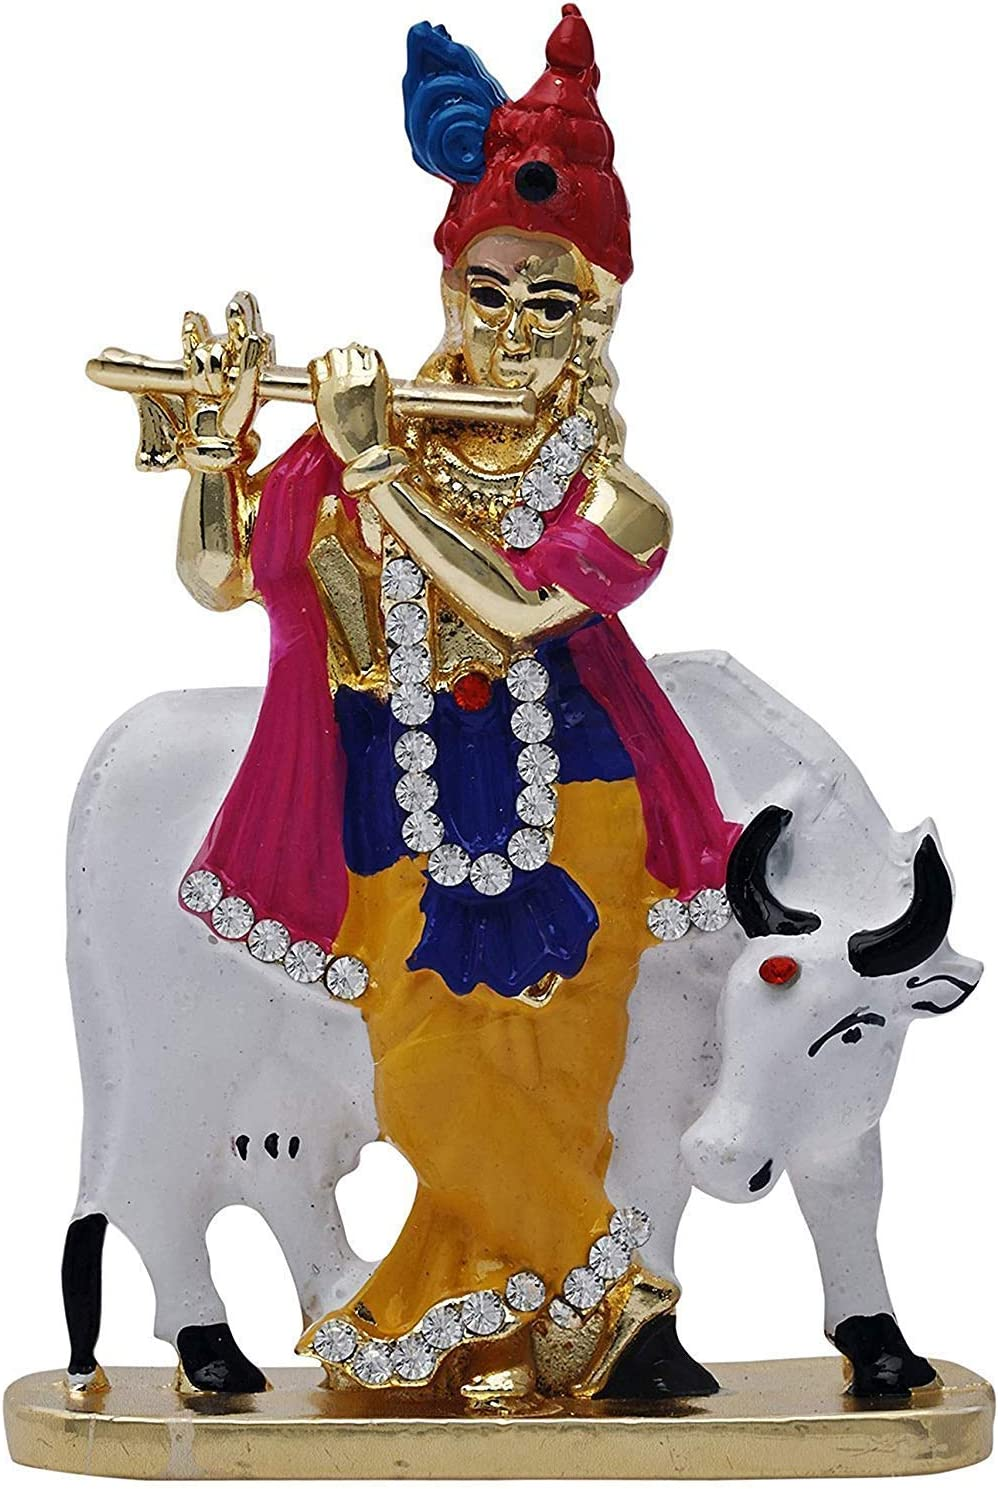 Artisans Orissa Krishna Idol for Car Dashboard/Home/Office Item